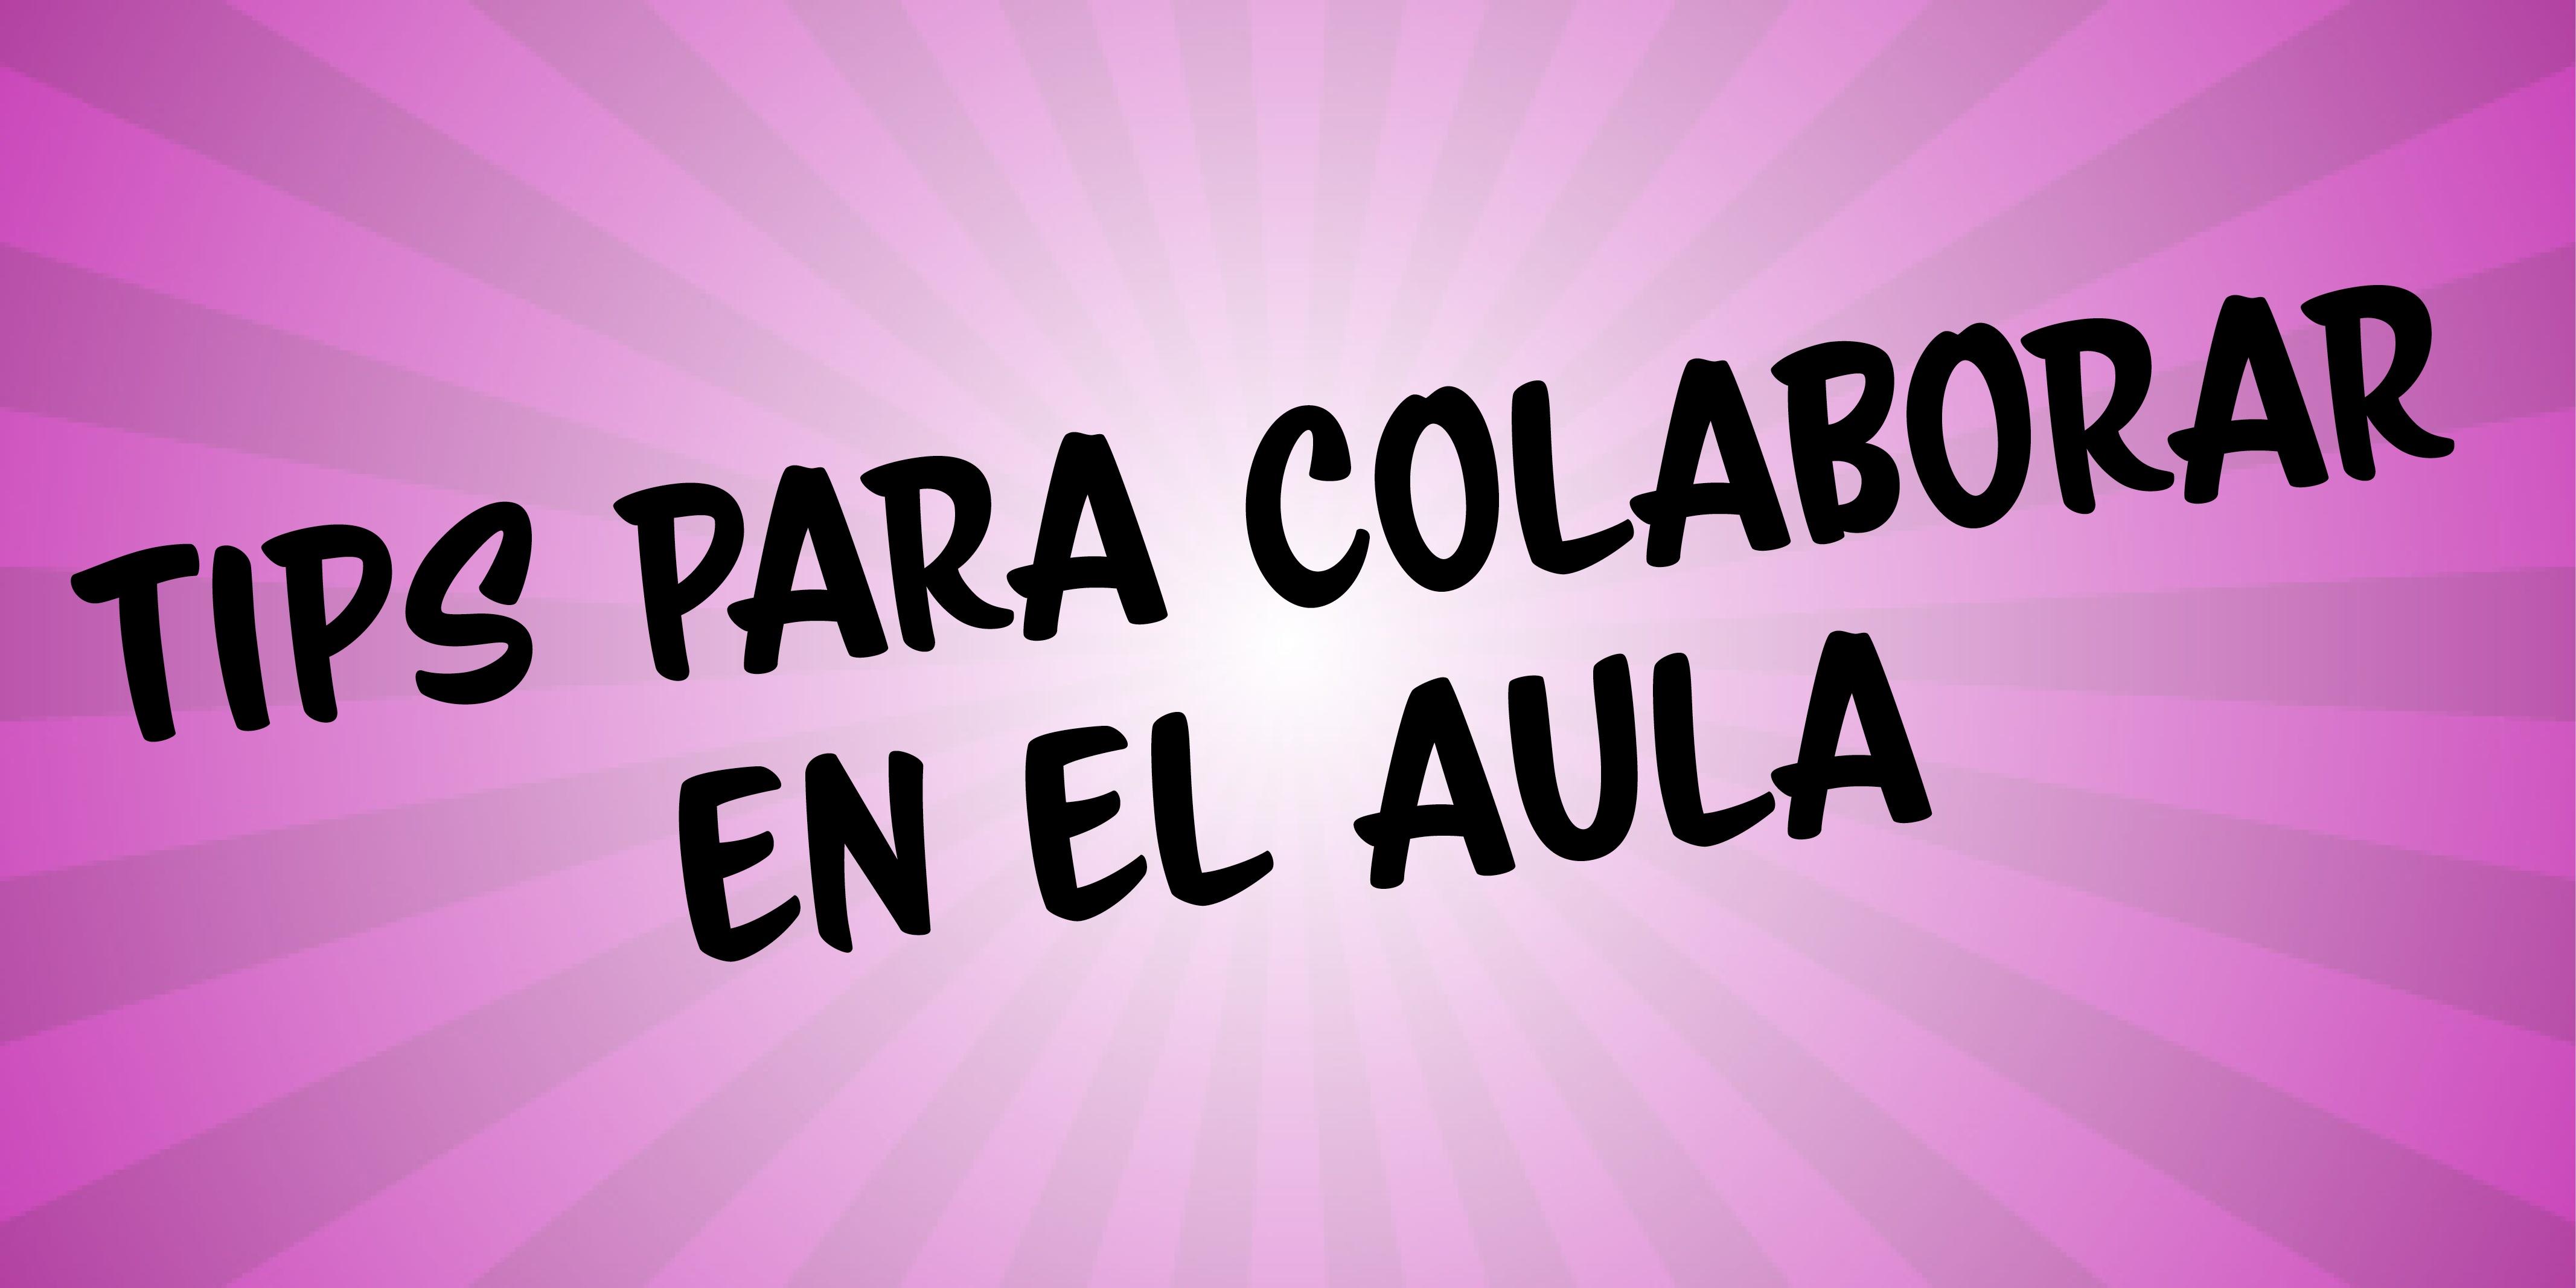 IdeasParaColaborarEnElAula.jpg